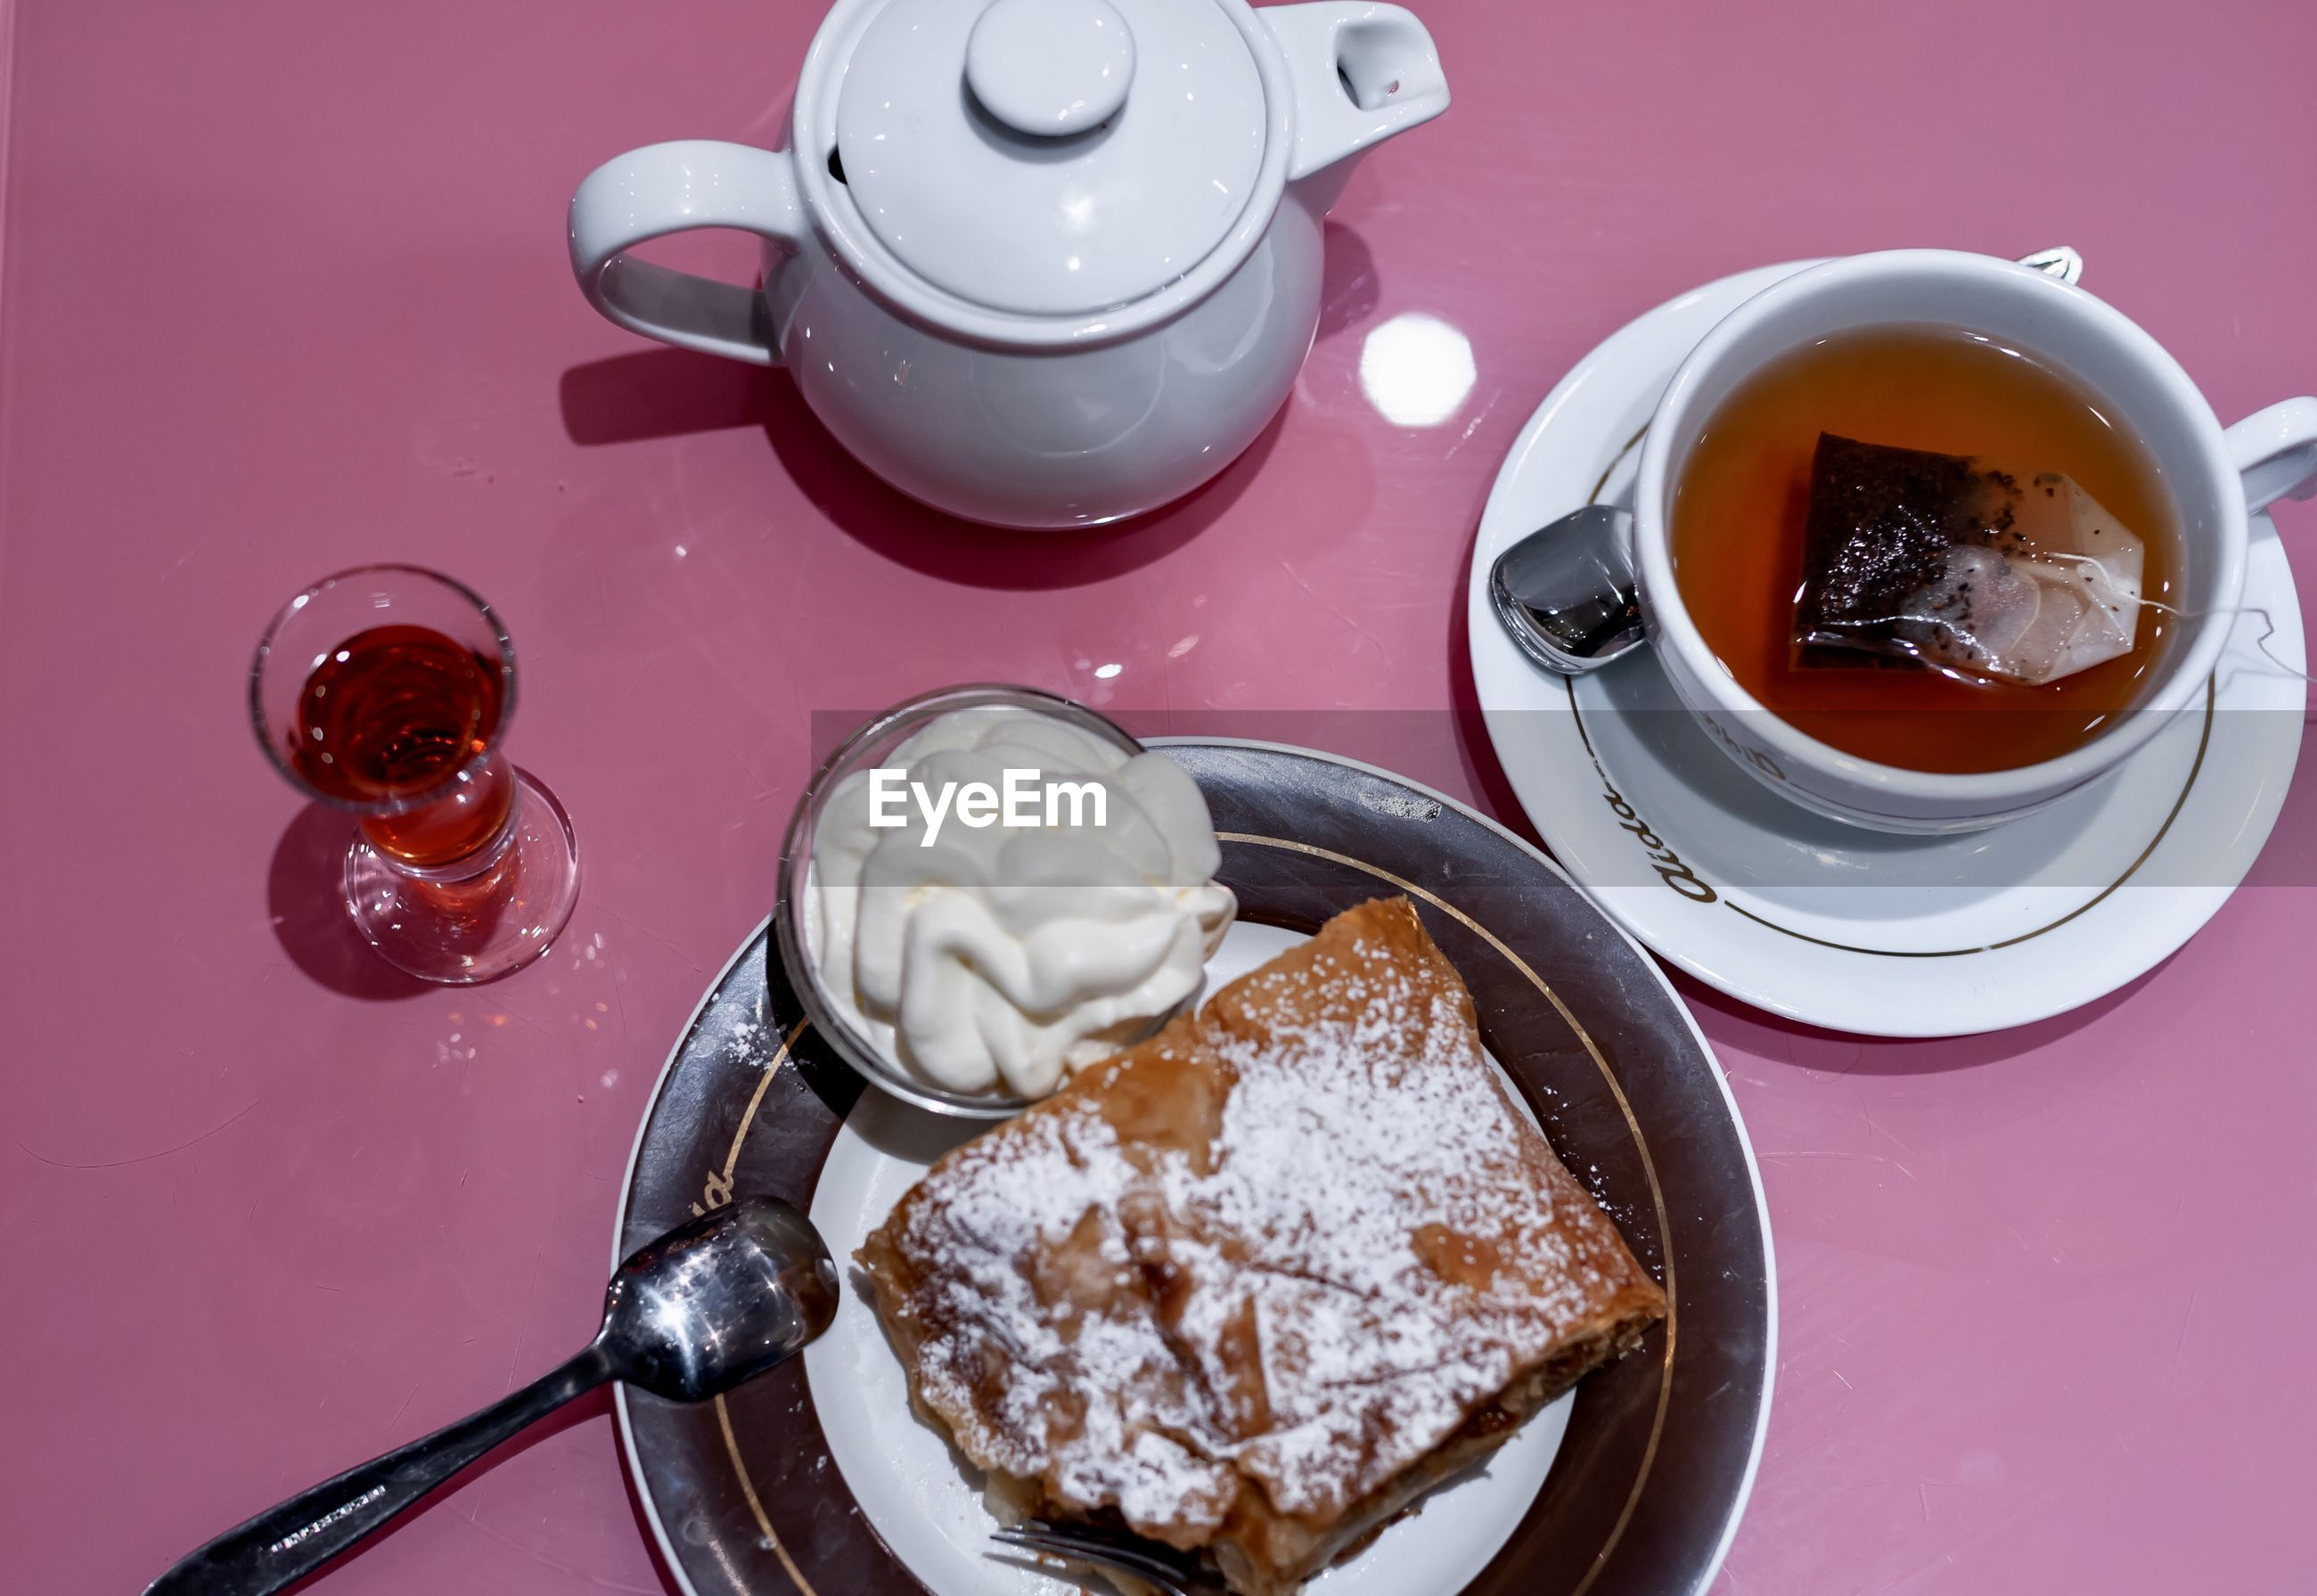 HIGH ANGLE VIEW OF TEA WITH COFFEE